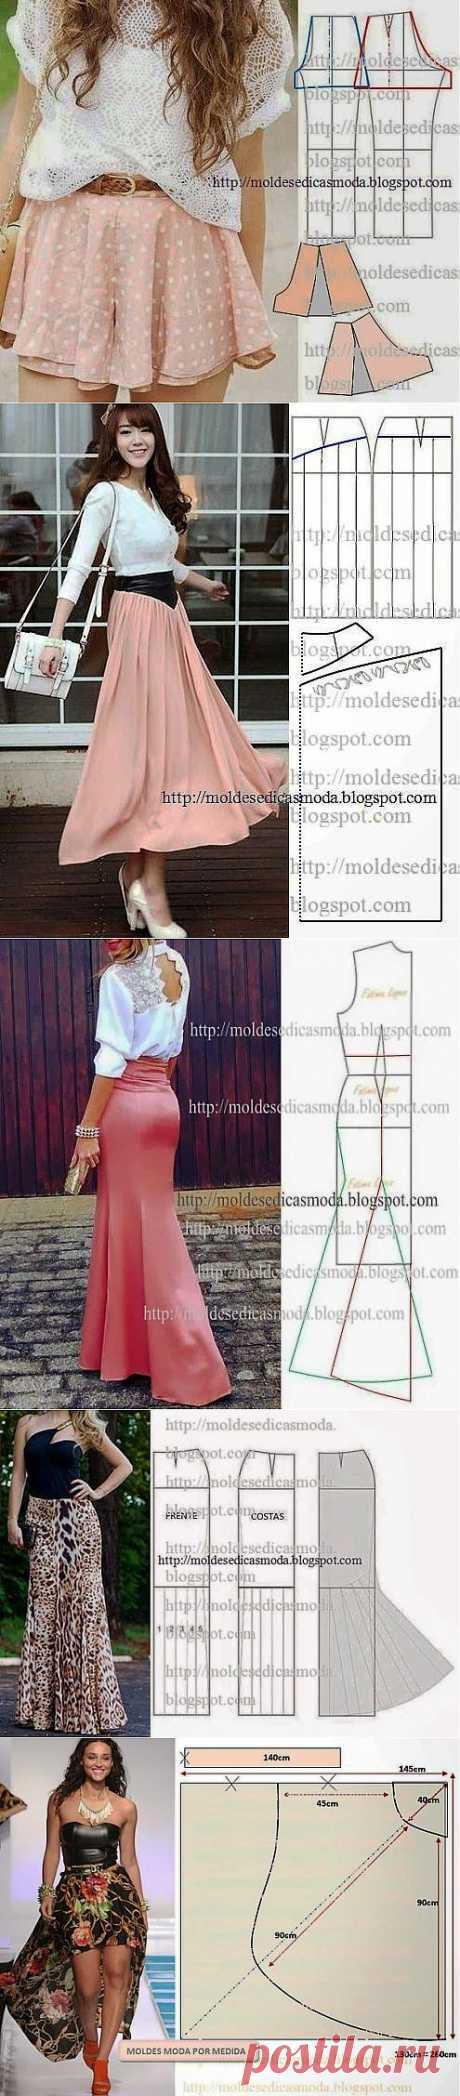 Summer skirts. Patterns | Skilful handles